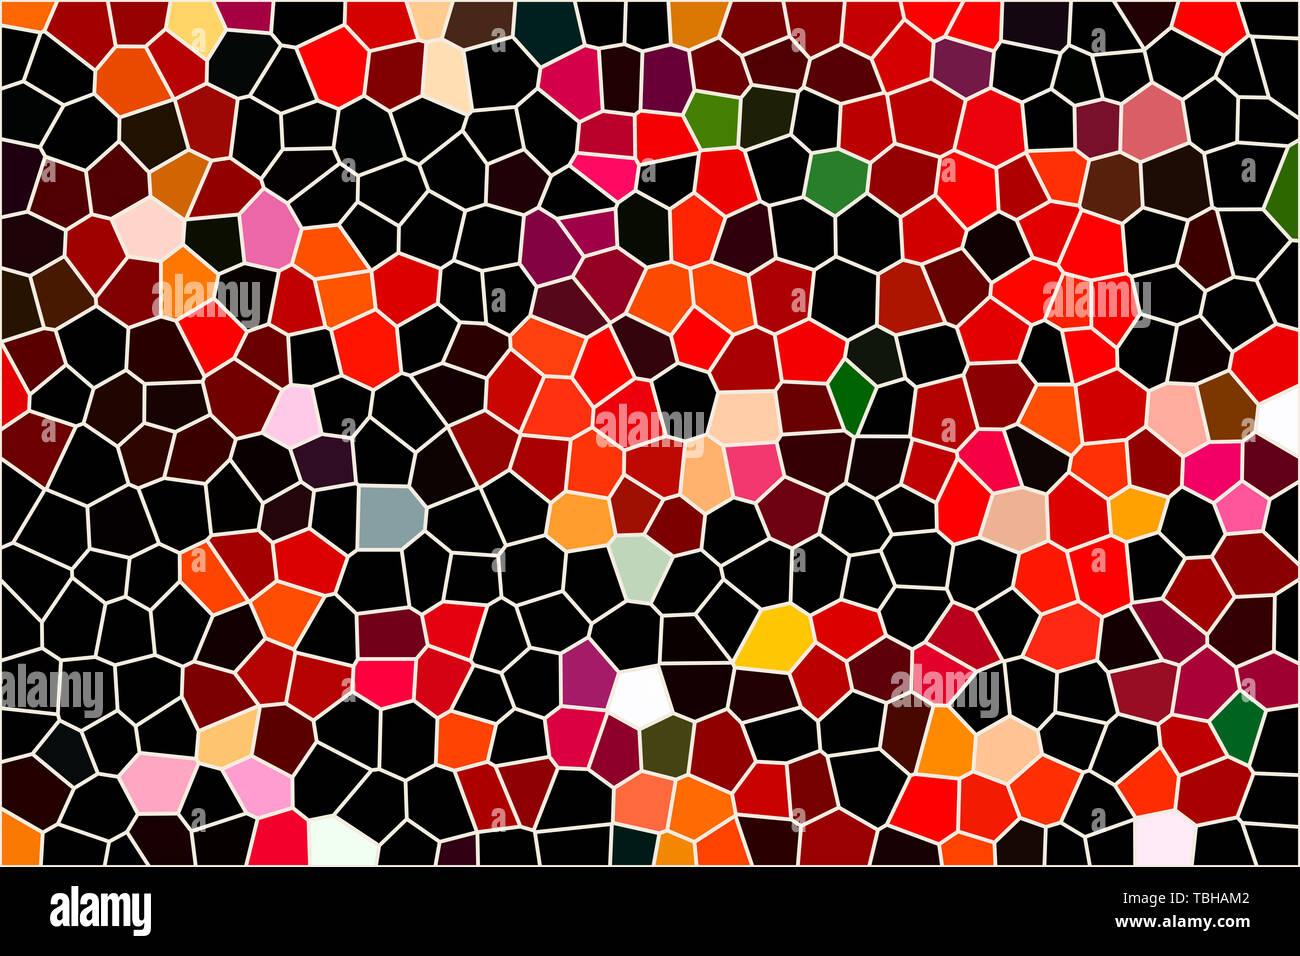 Pixel Spectrum Photos Pixel Spectrum Images Alamy